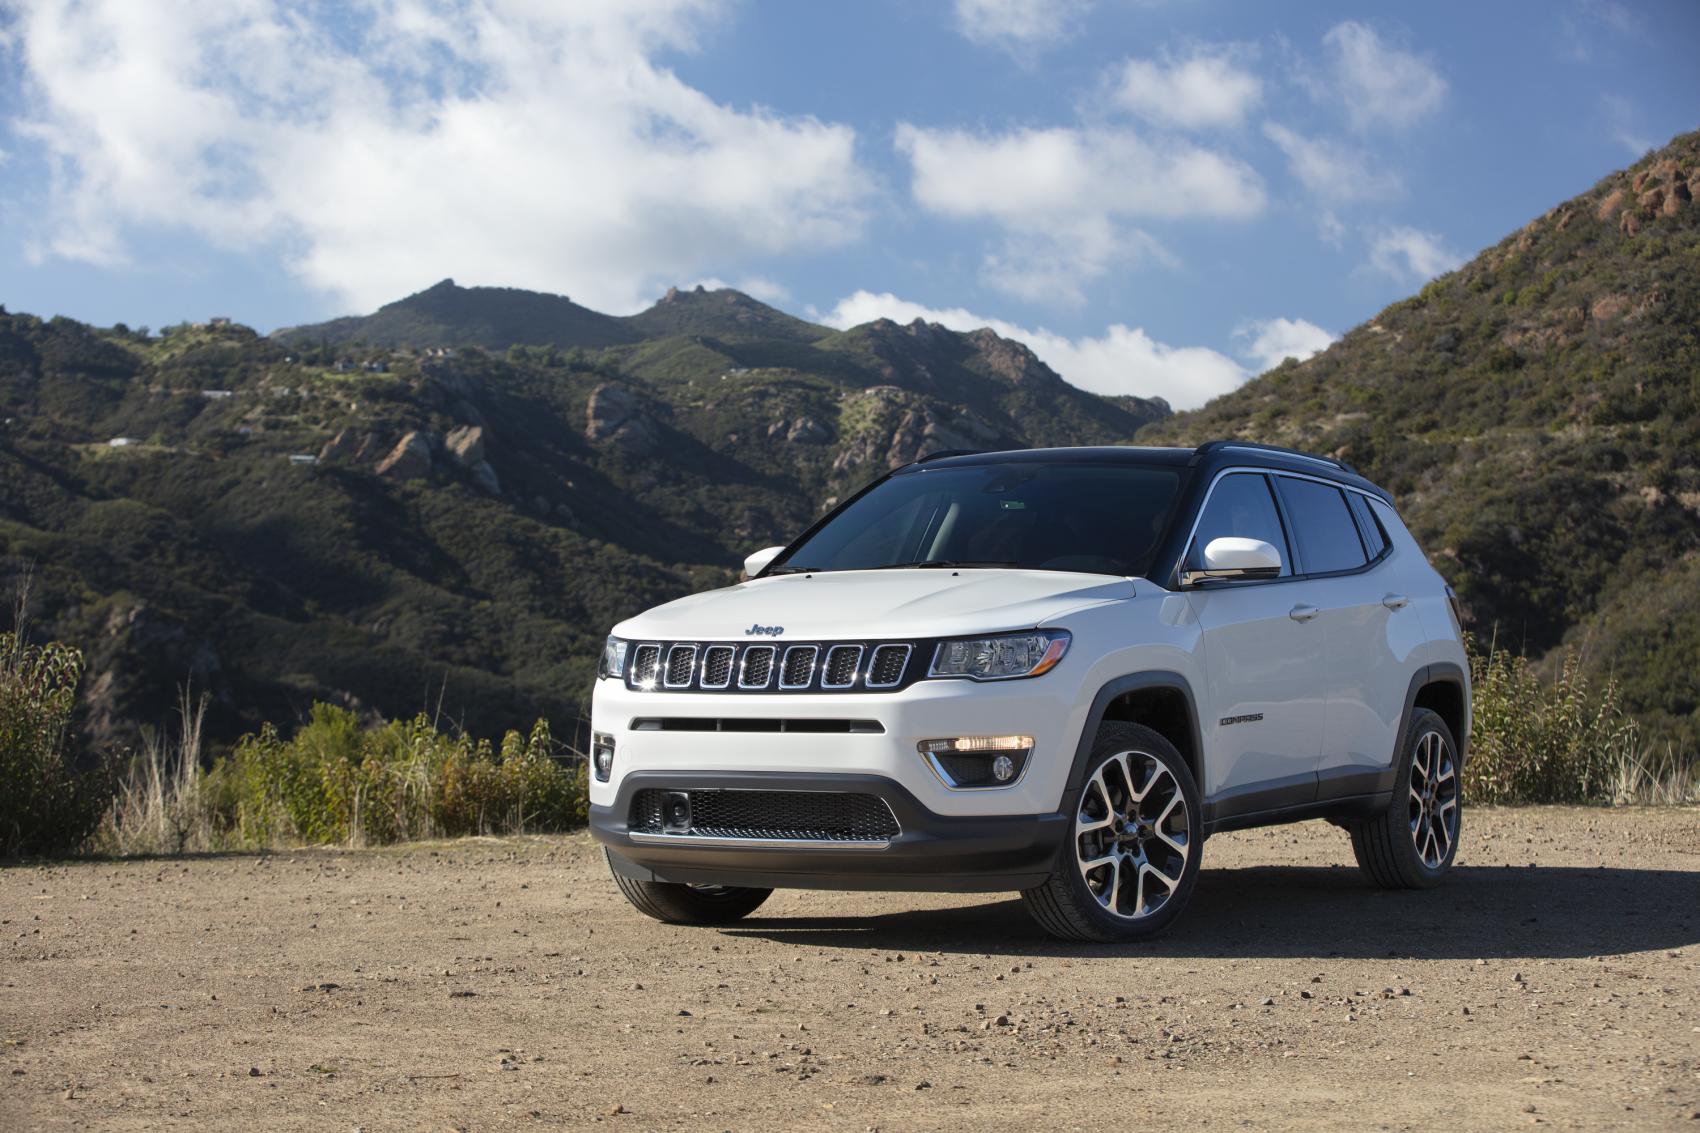 2021 Jeep Compass White Mountains Grava CDJR